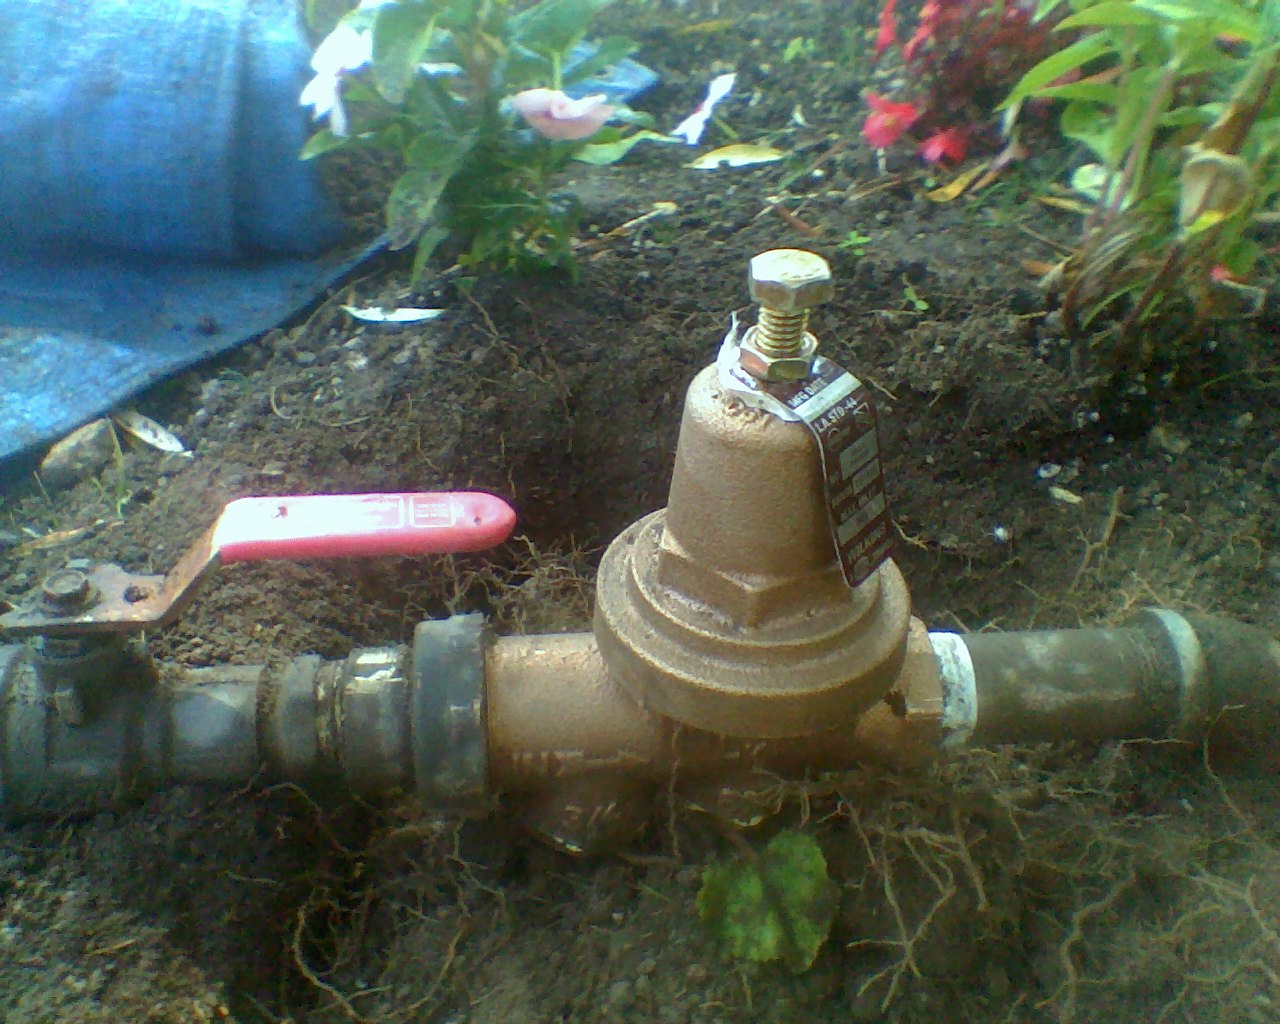 101sprinklers repair and install pressure regulator onto water supply pipe for sprinkler system. Black Bedroom Furniture Sets. Home Design Ideas